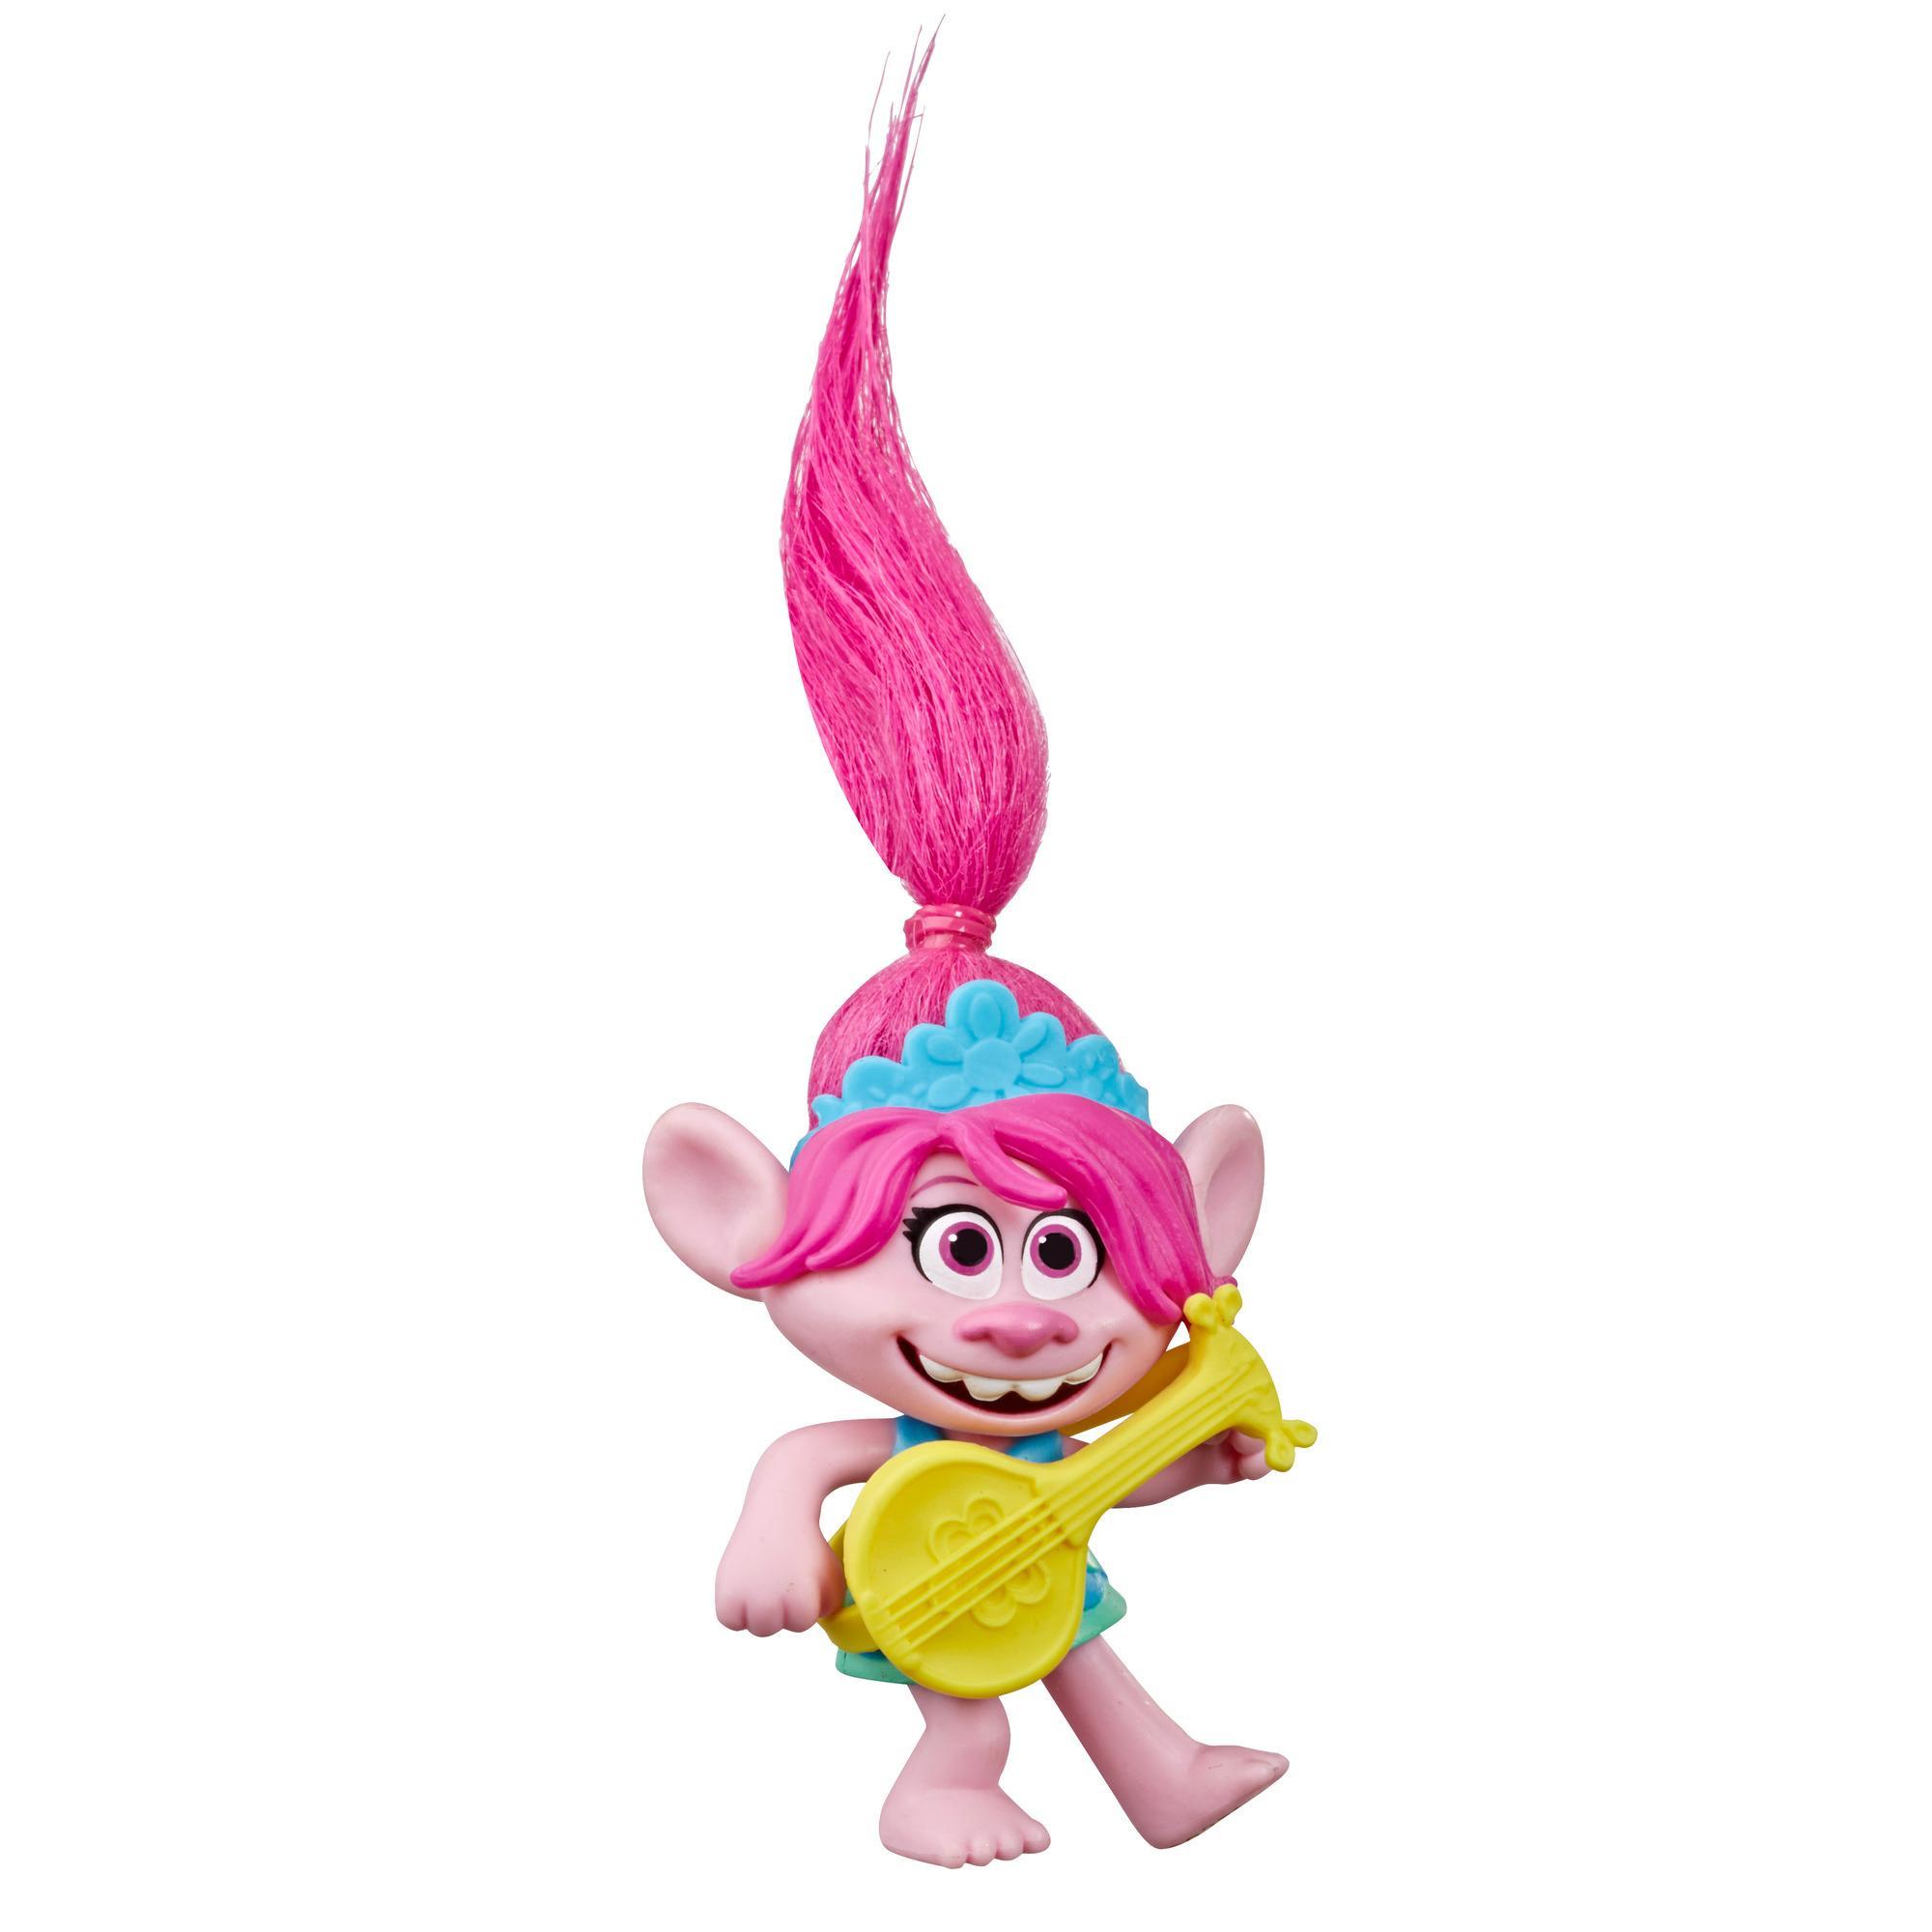 DreamWorks Trolls World Tour - Poppy - Bambola Poppy con ukulele - Giocattolo ispirato al film Trolls World Tour